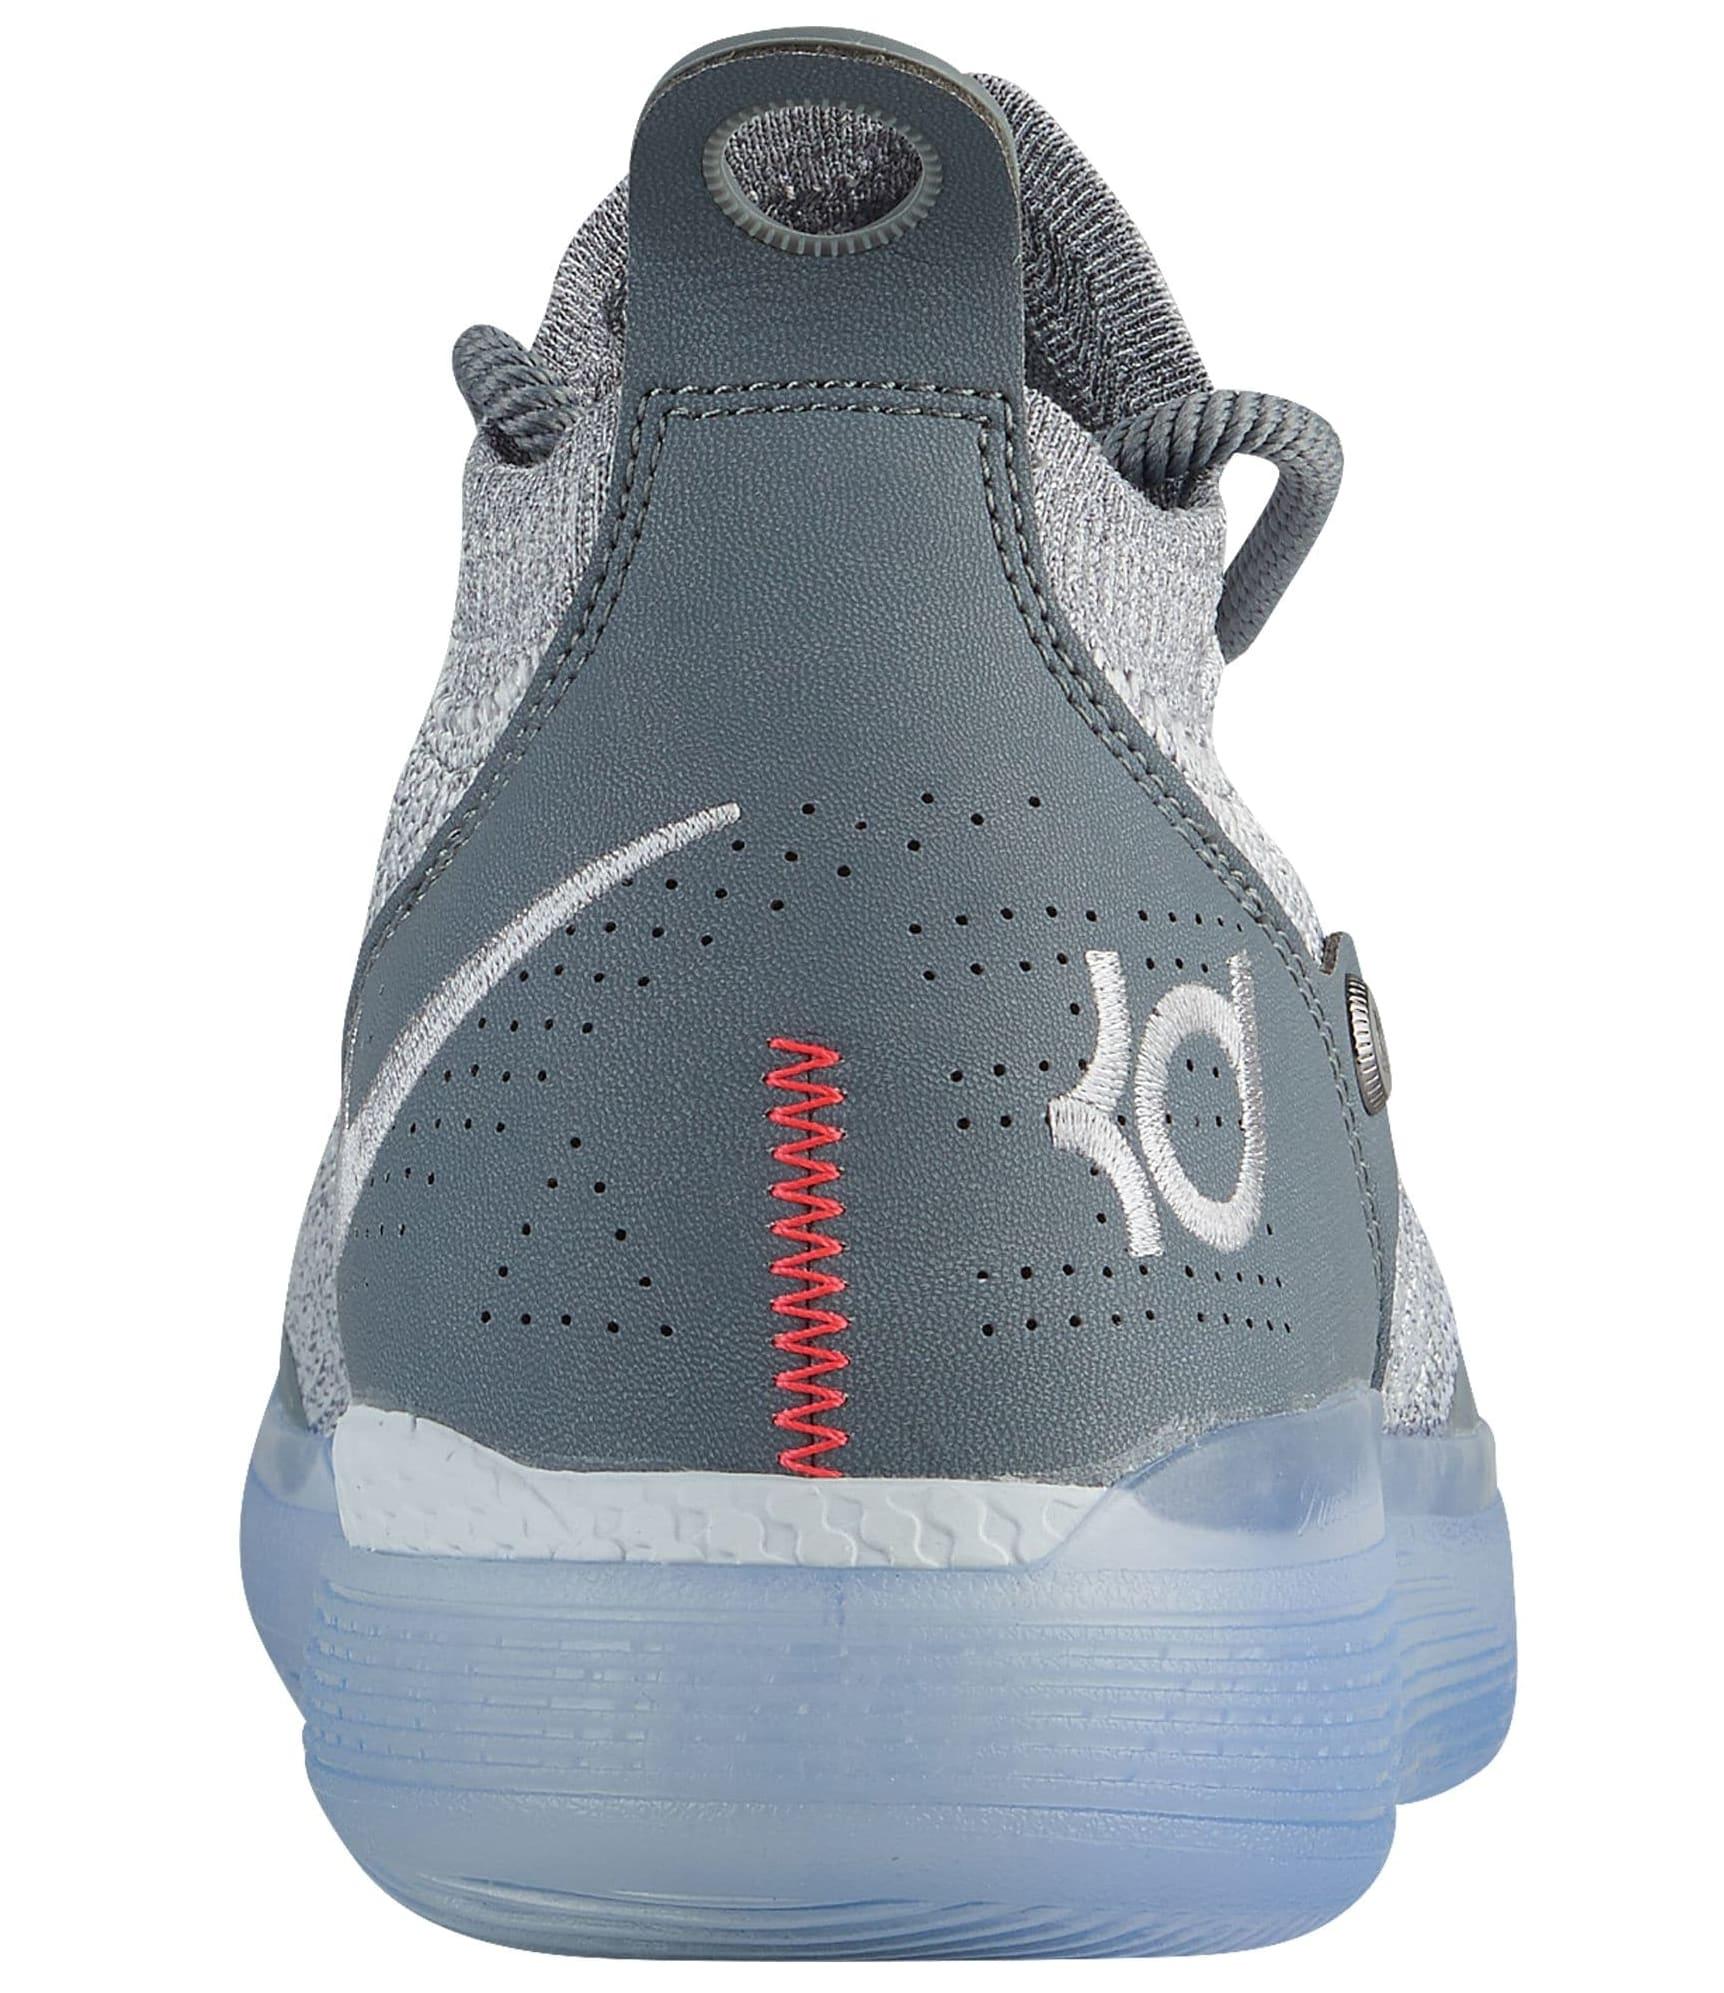 nike-kd-11-cool-grey-ao2604-002-heel